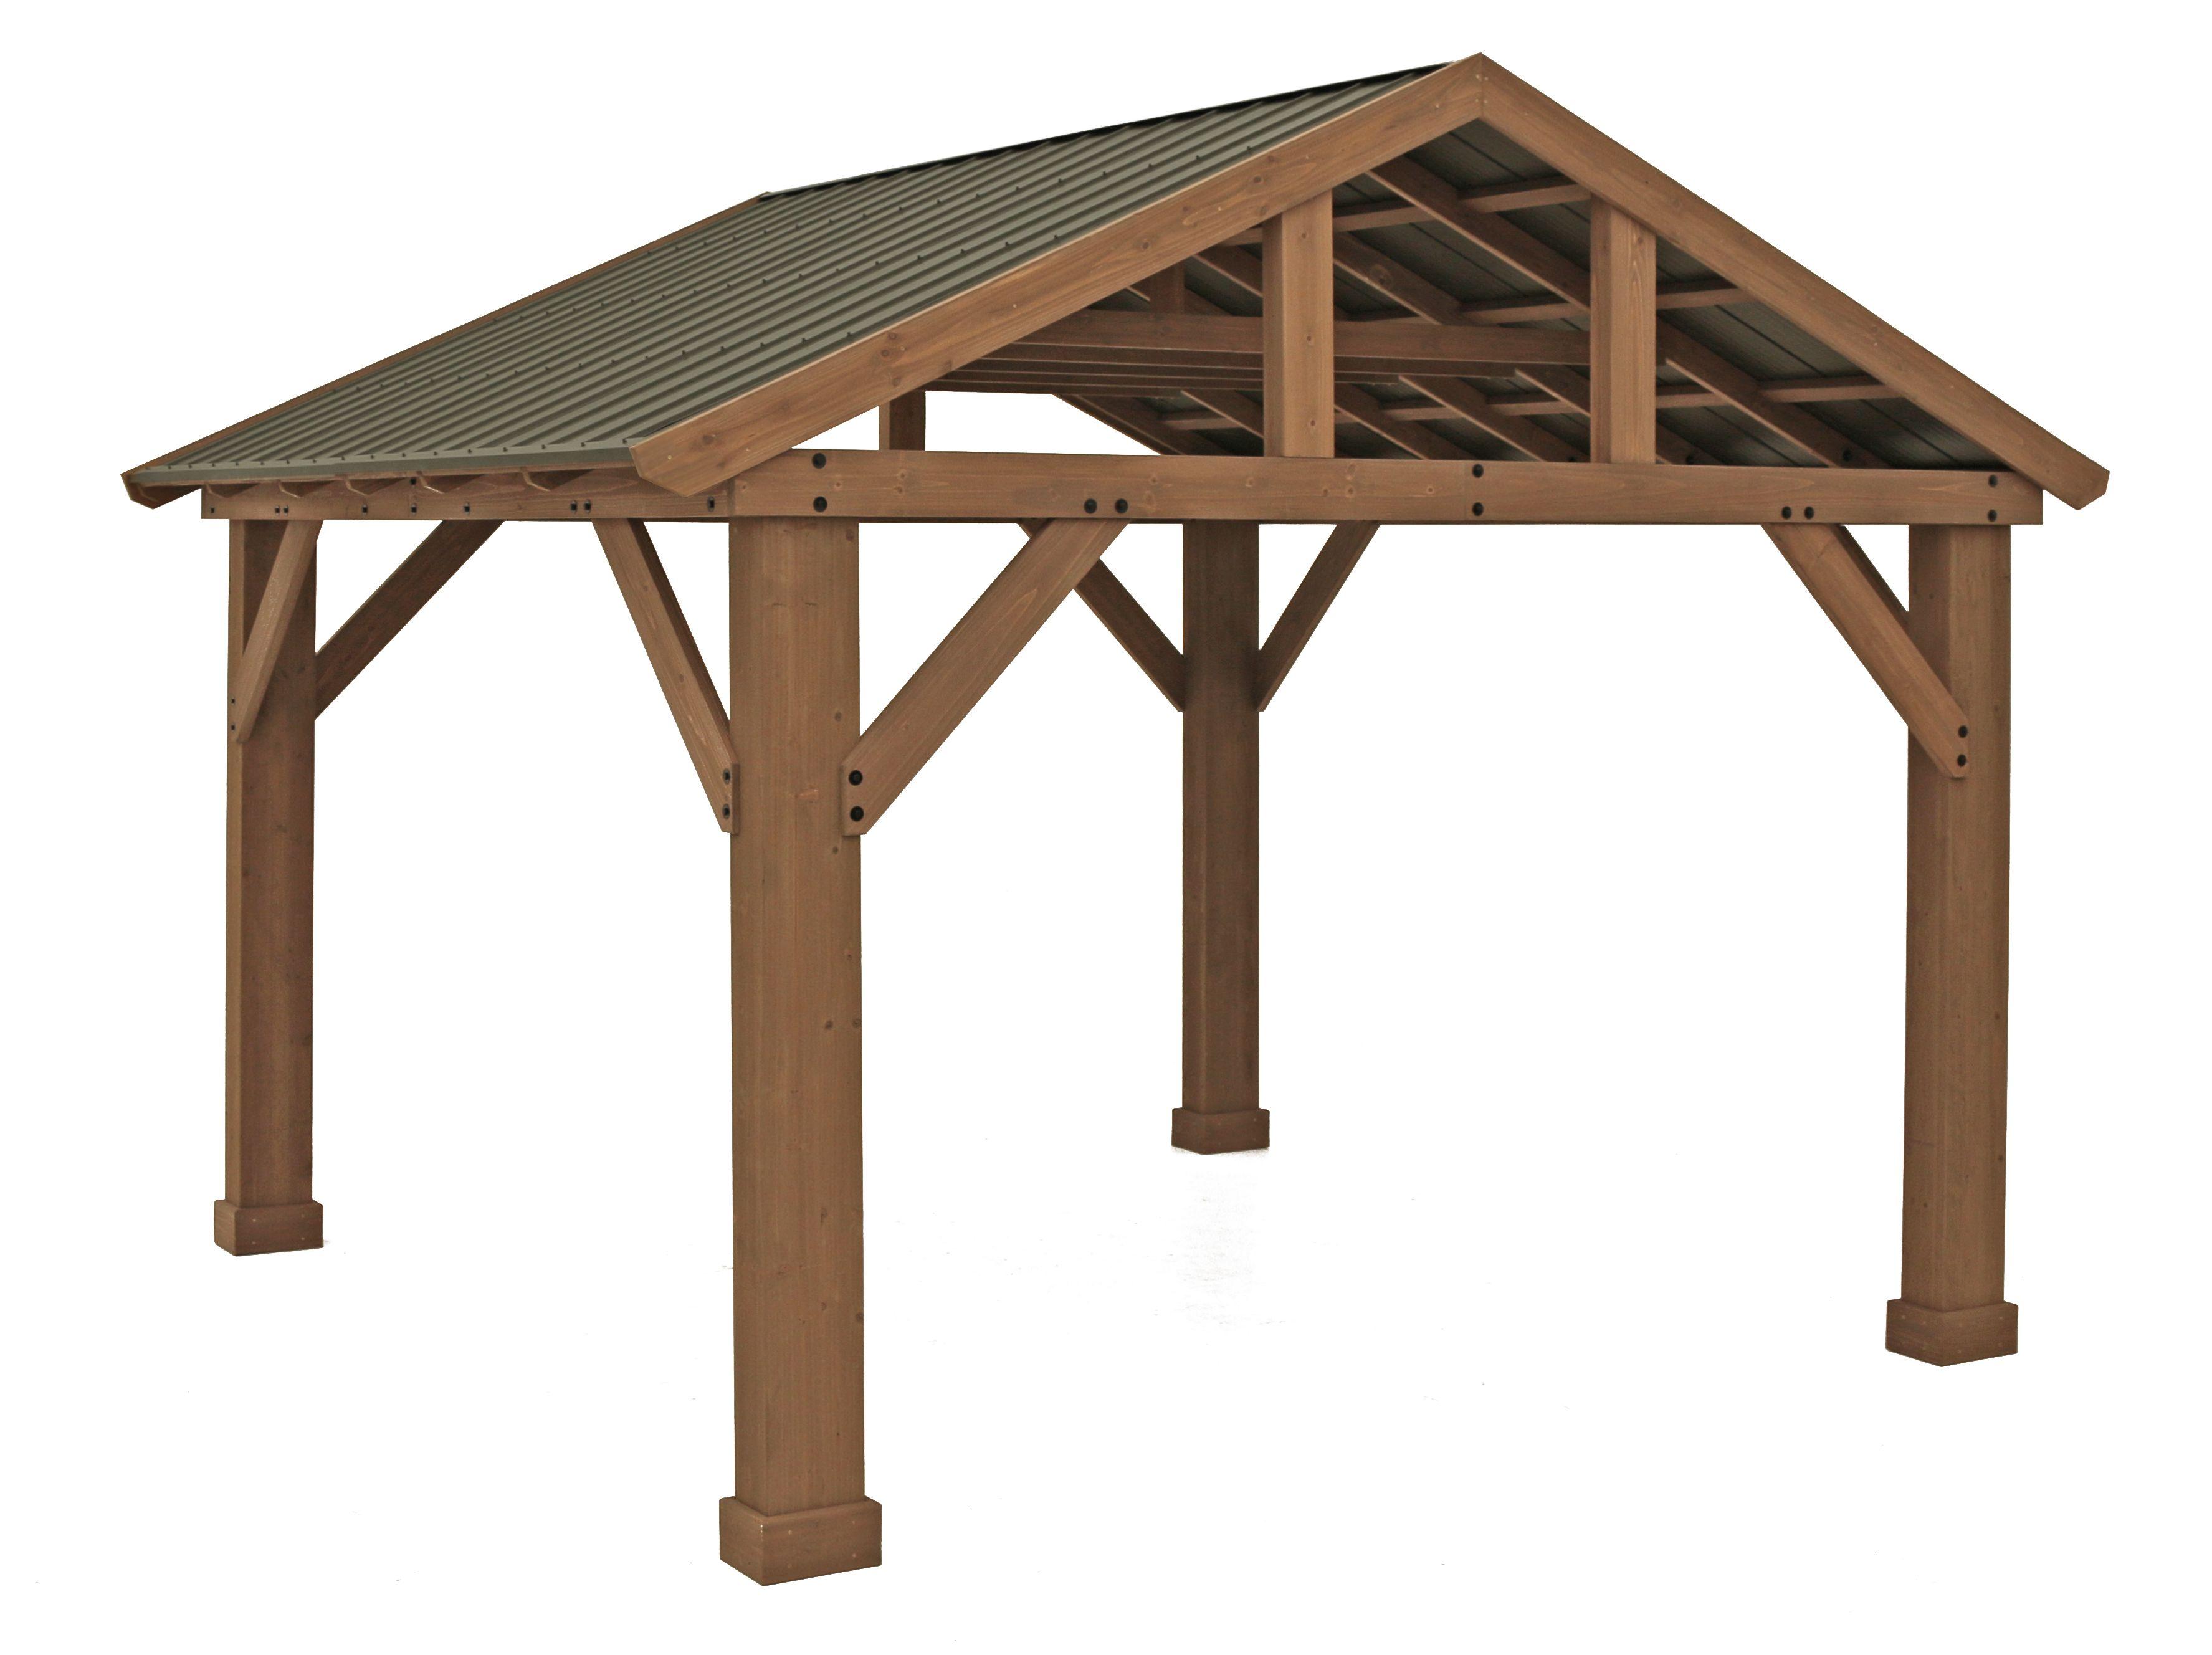 Yardistry 14' x 12' Cedar Pavilion with Aluminum Roof | eBay on Yardistry Backyard Pavilion id=88265